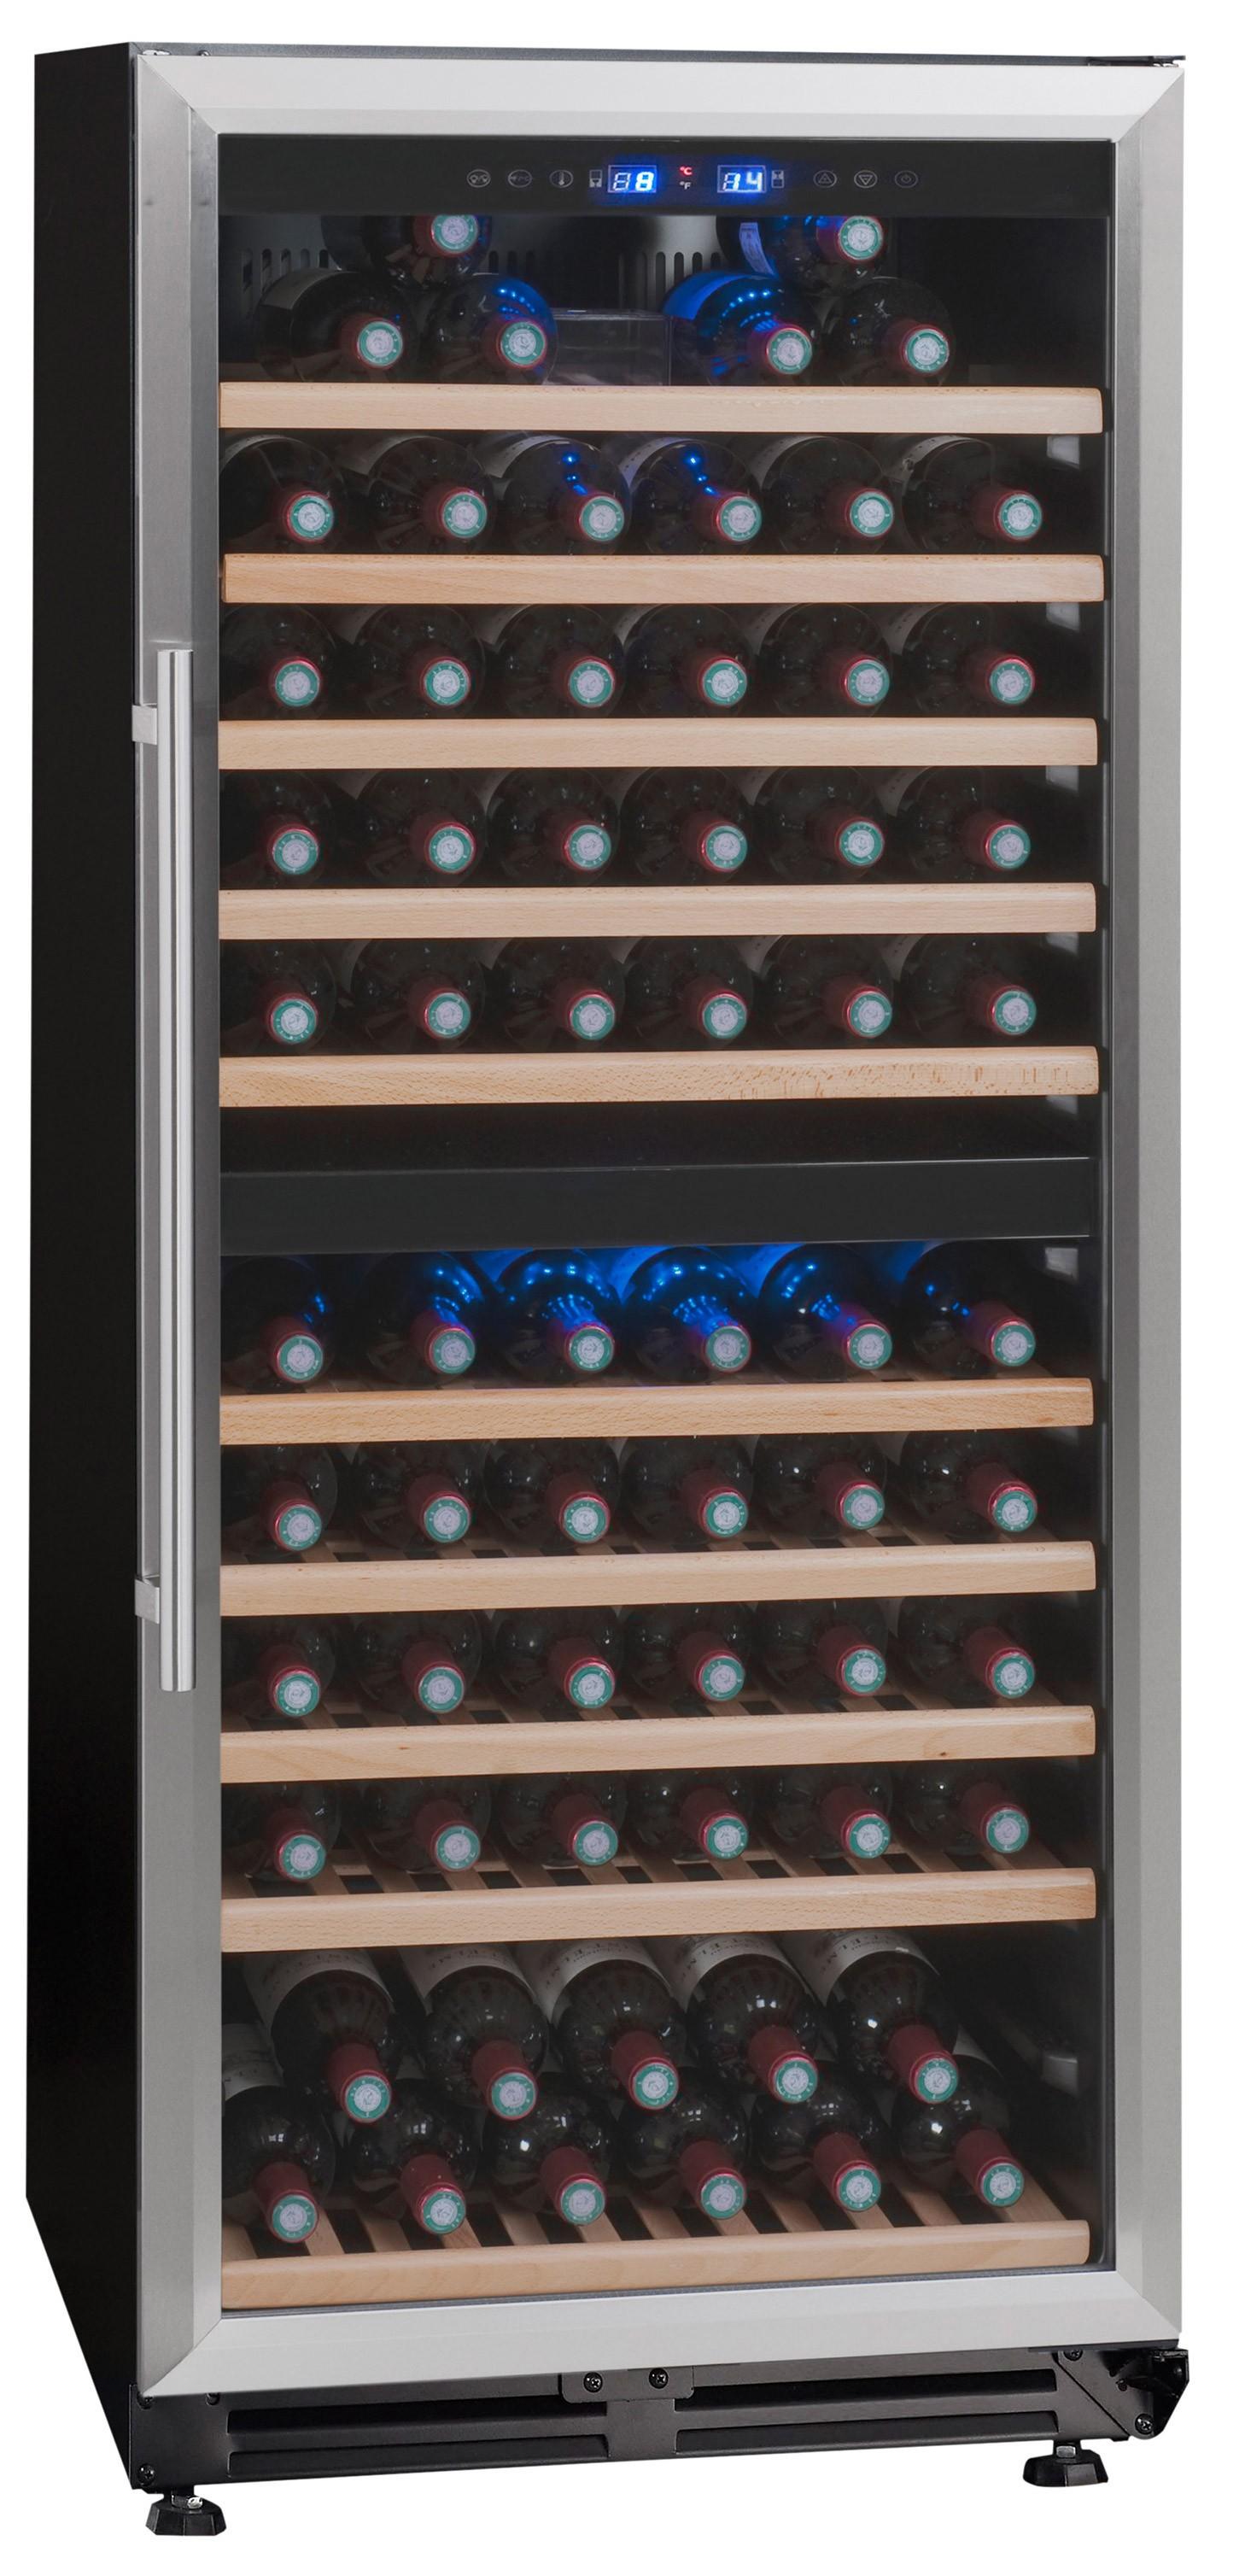 vinoteca 166 botellas tr2v121 doble zona temperatura wine cooler. Black Bedroom Furniture Sets. Home Design Ideas